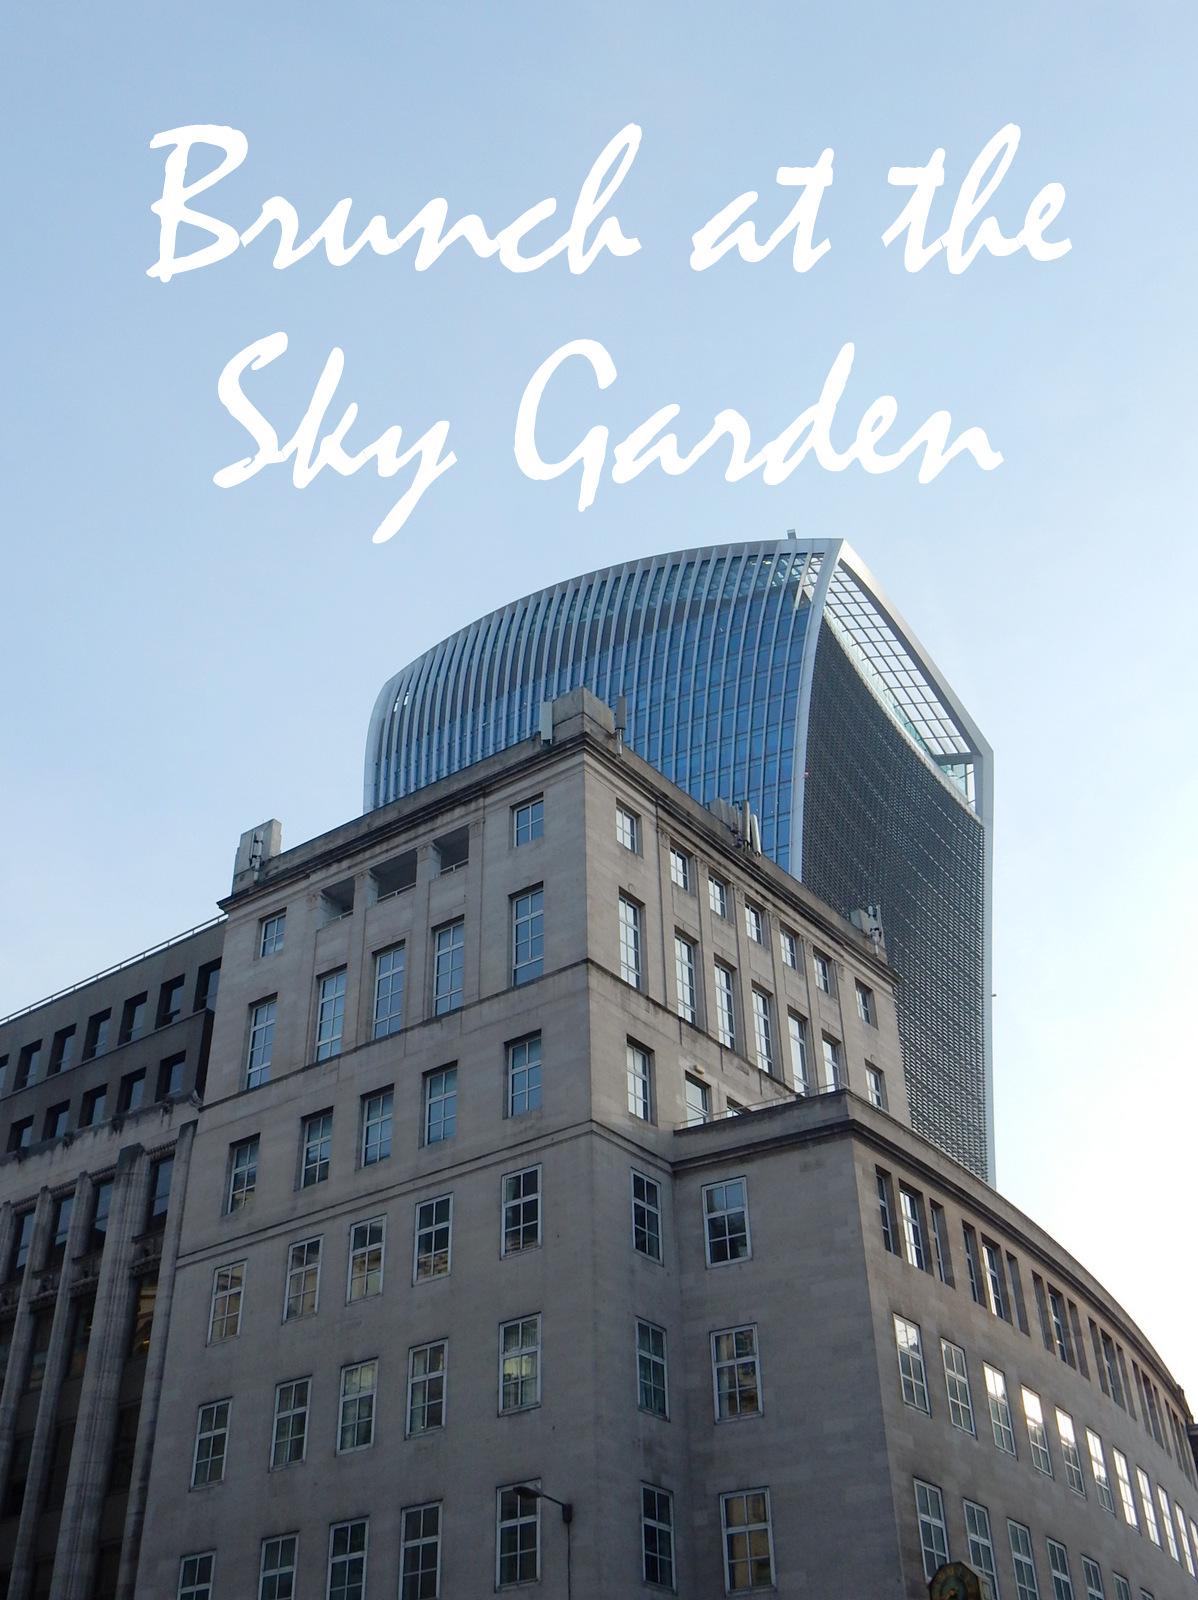 Darwin Brasserie Walkie Talkie Brunch with a view Adventures of a London Kiwi